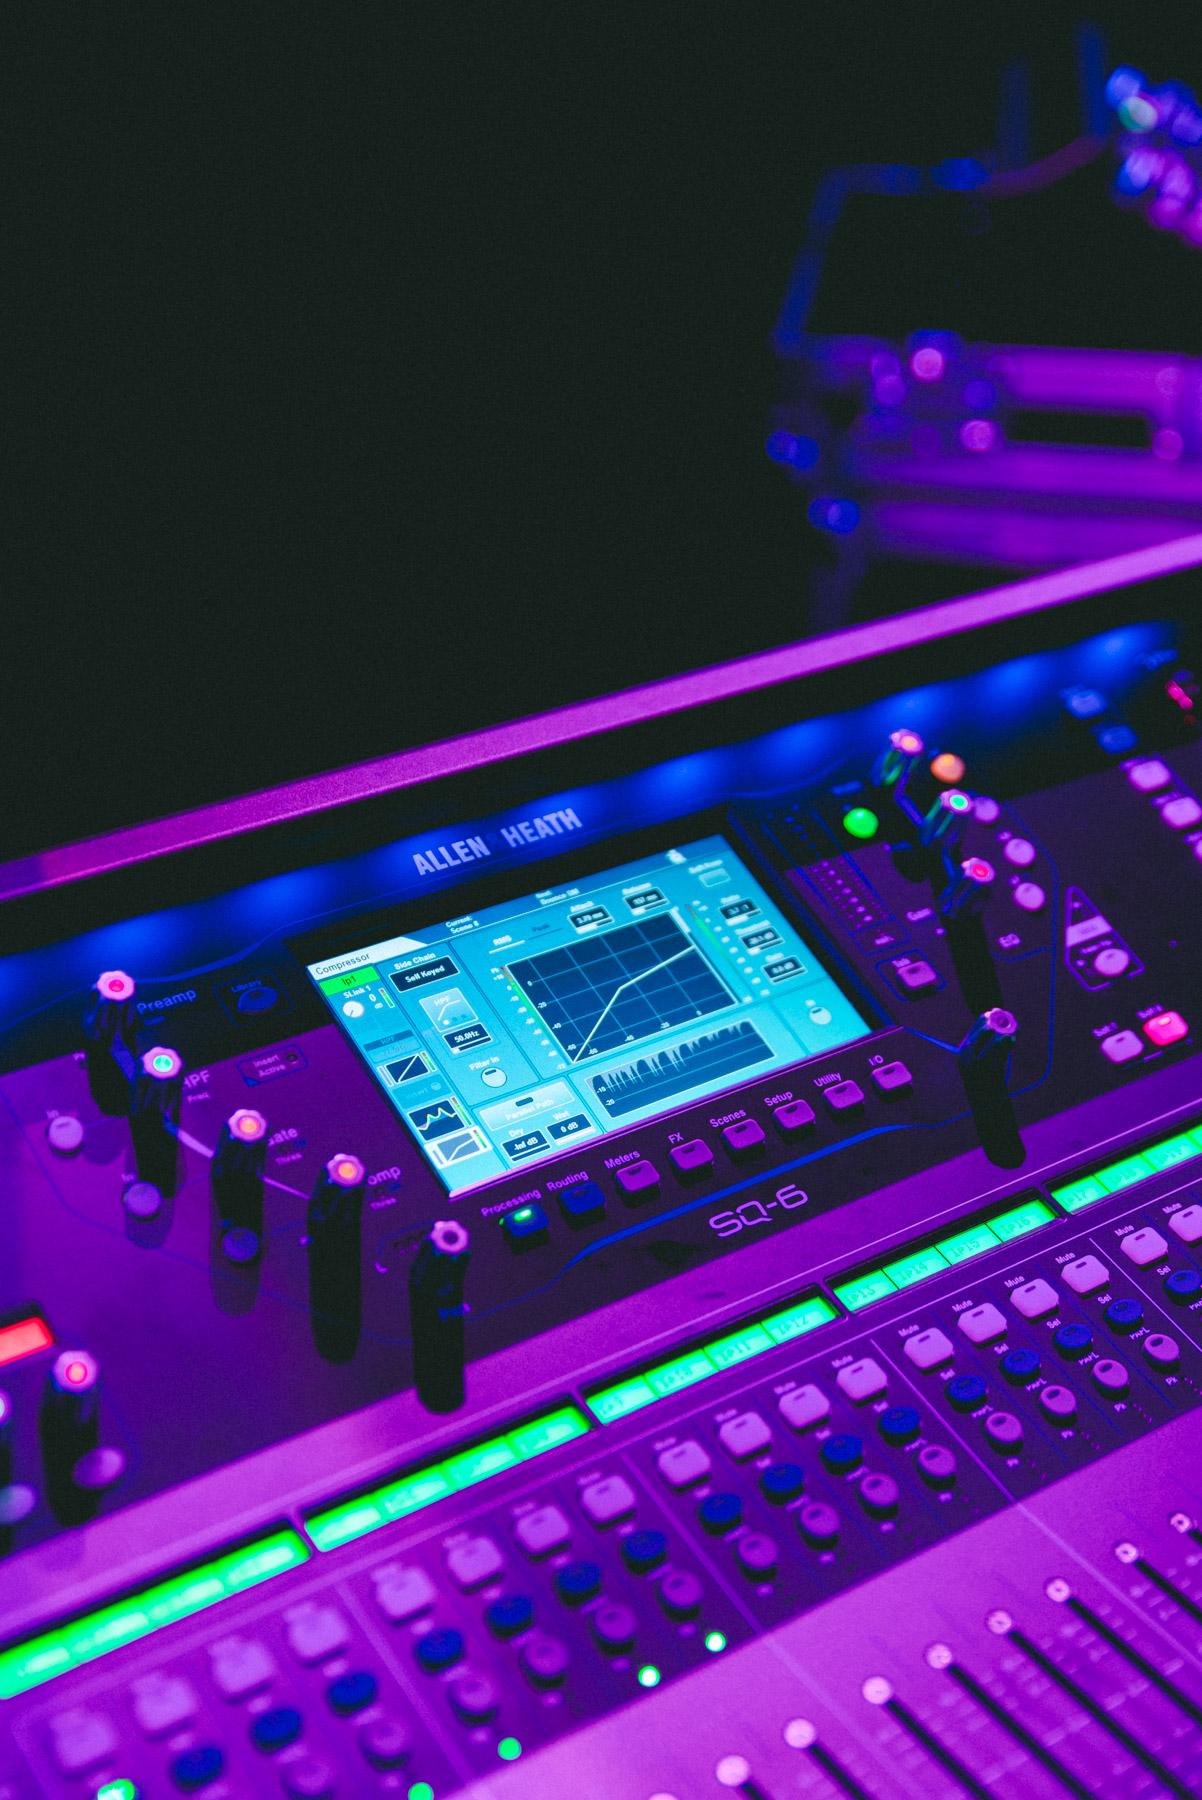 f1-sound-company-08.jpg